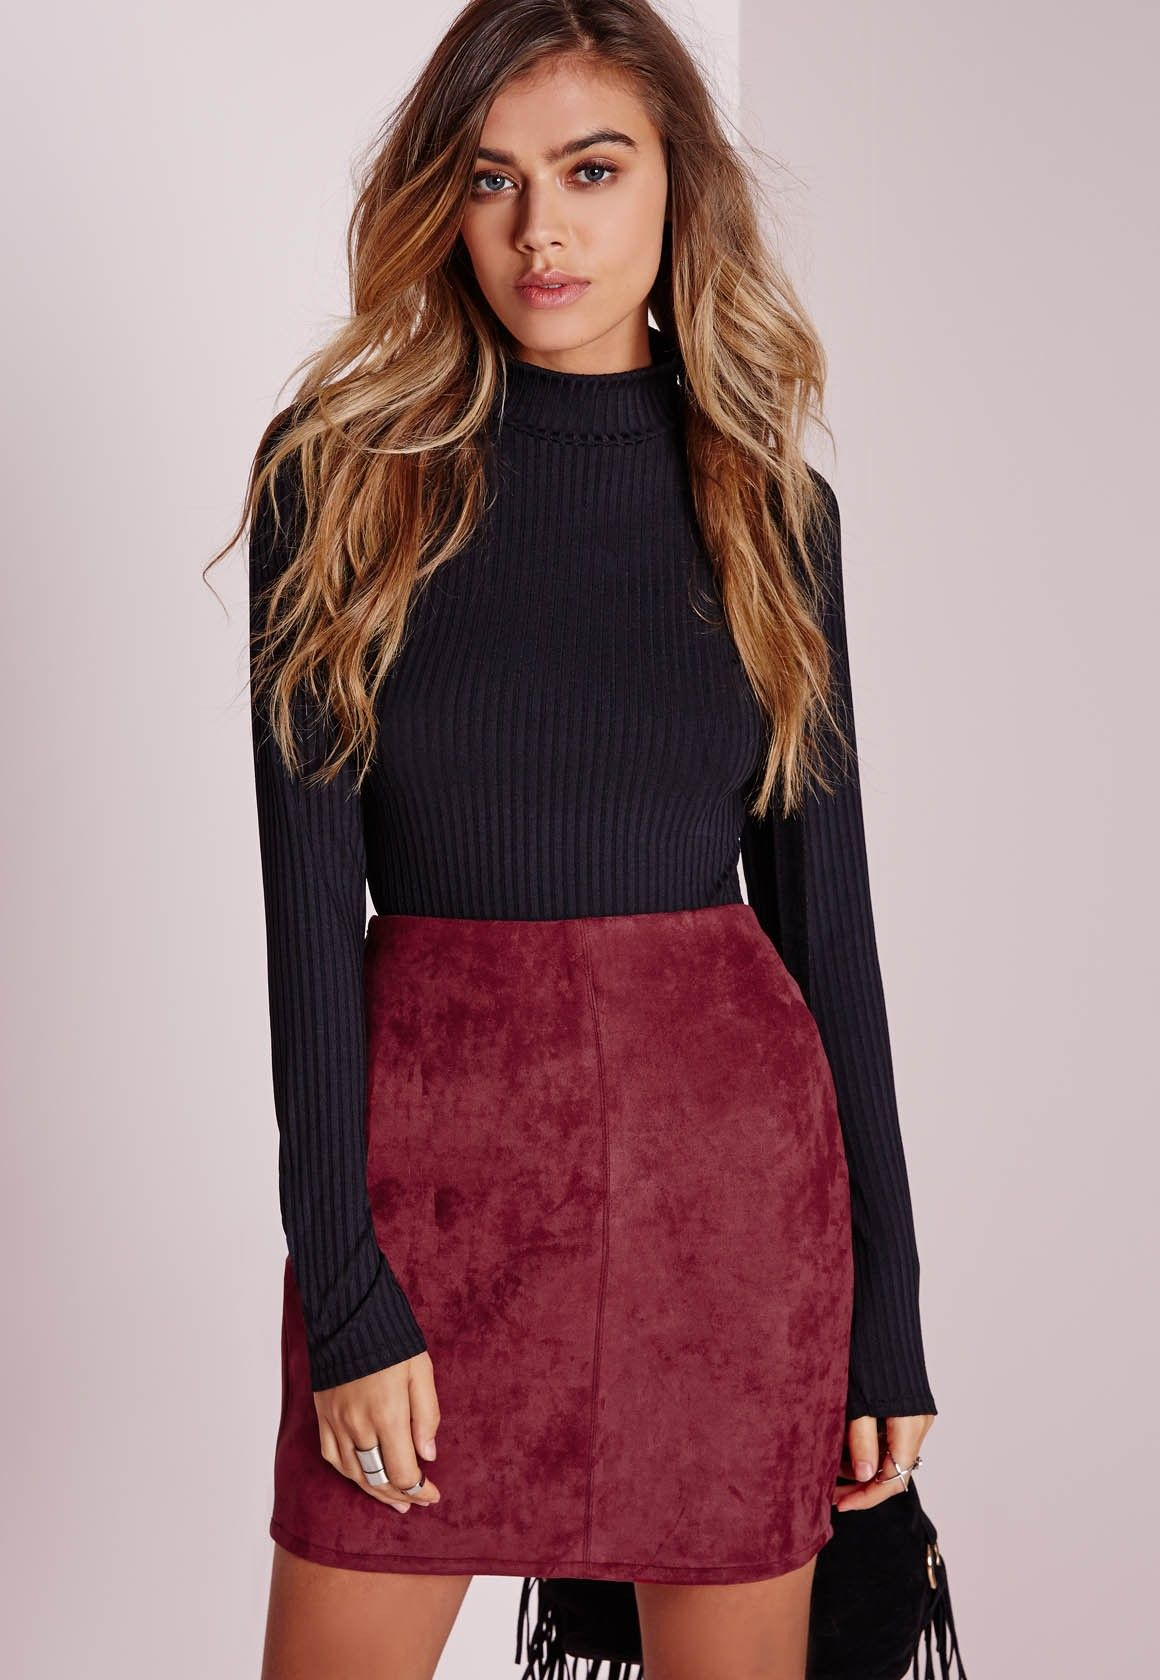 Missguided - Faux Suede Mini Skirt Burgundy | Fashion | Pinterest ...